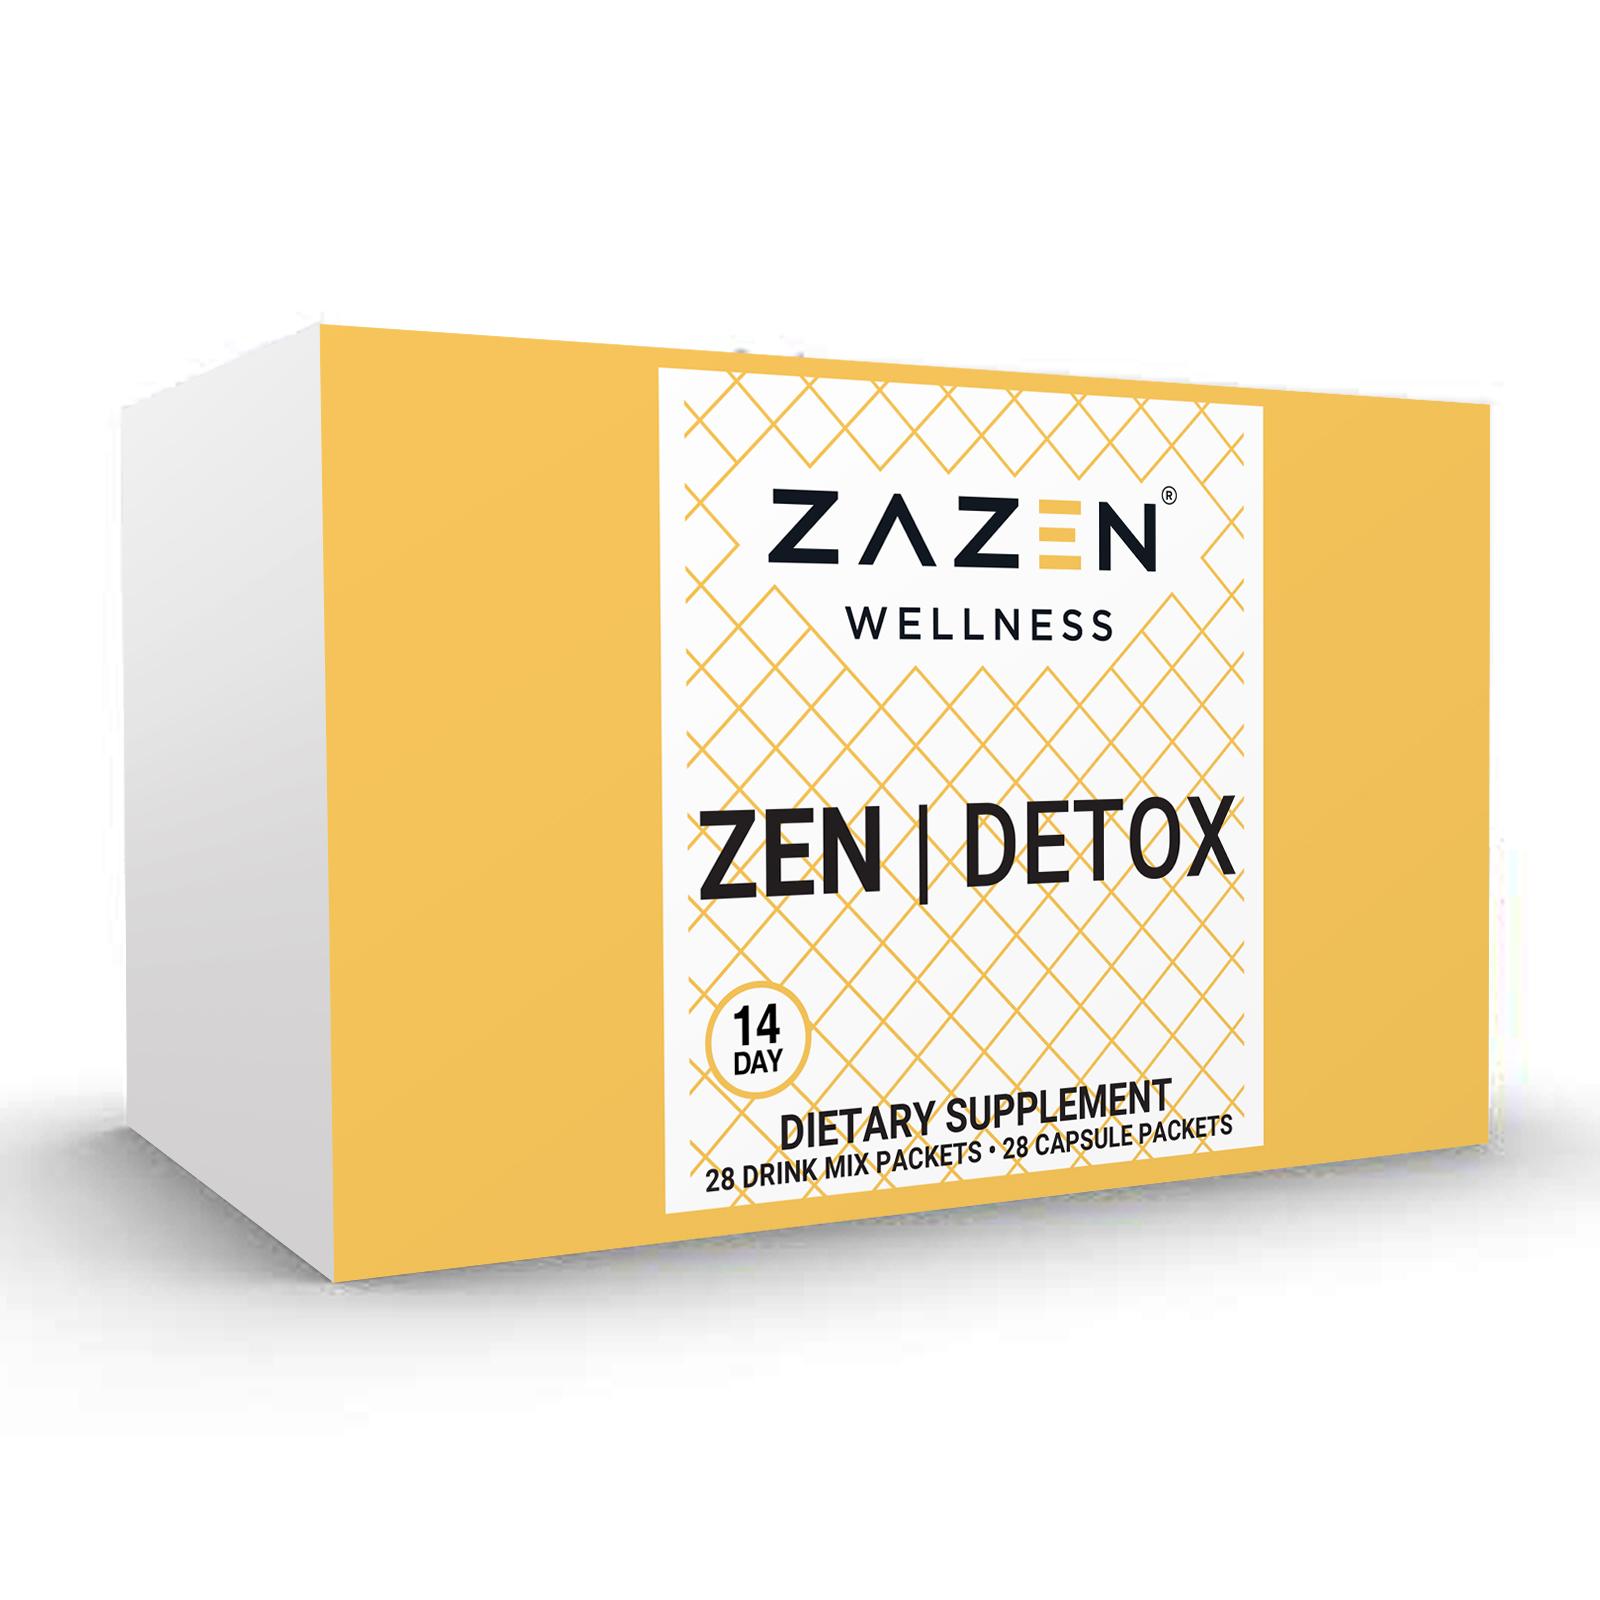 Tamerisa R-PPP14D-PL-1-Zen Detox (FRONT).jpg